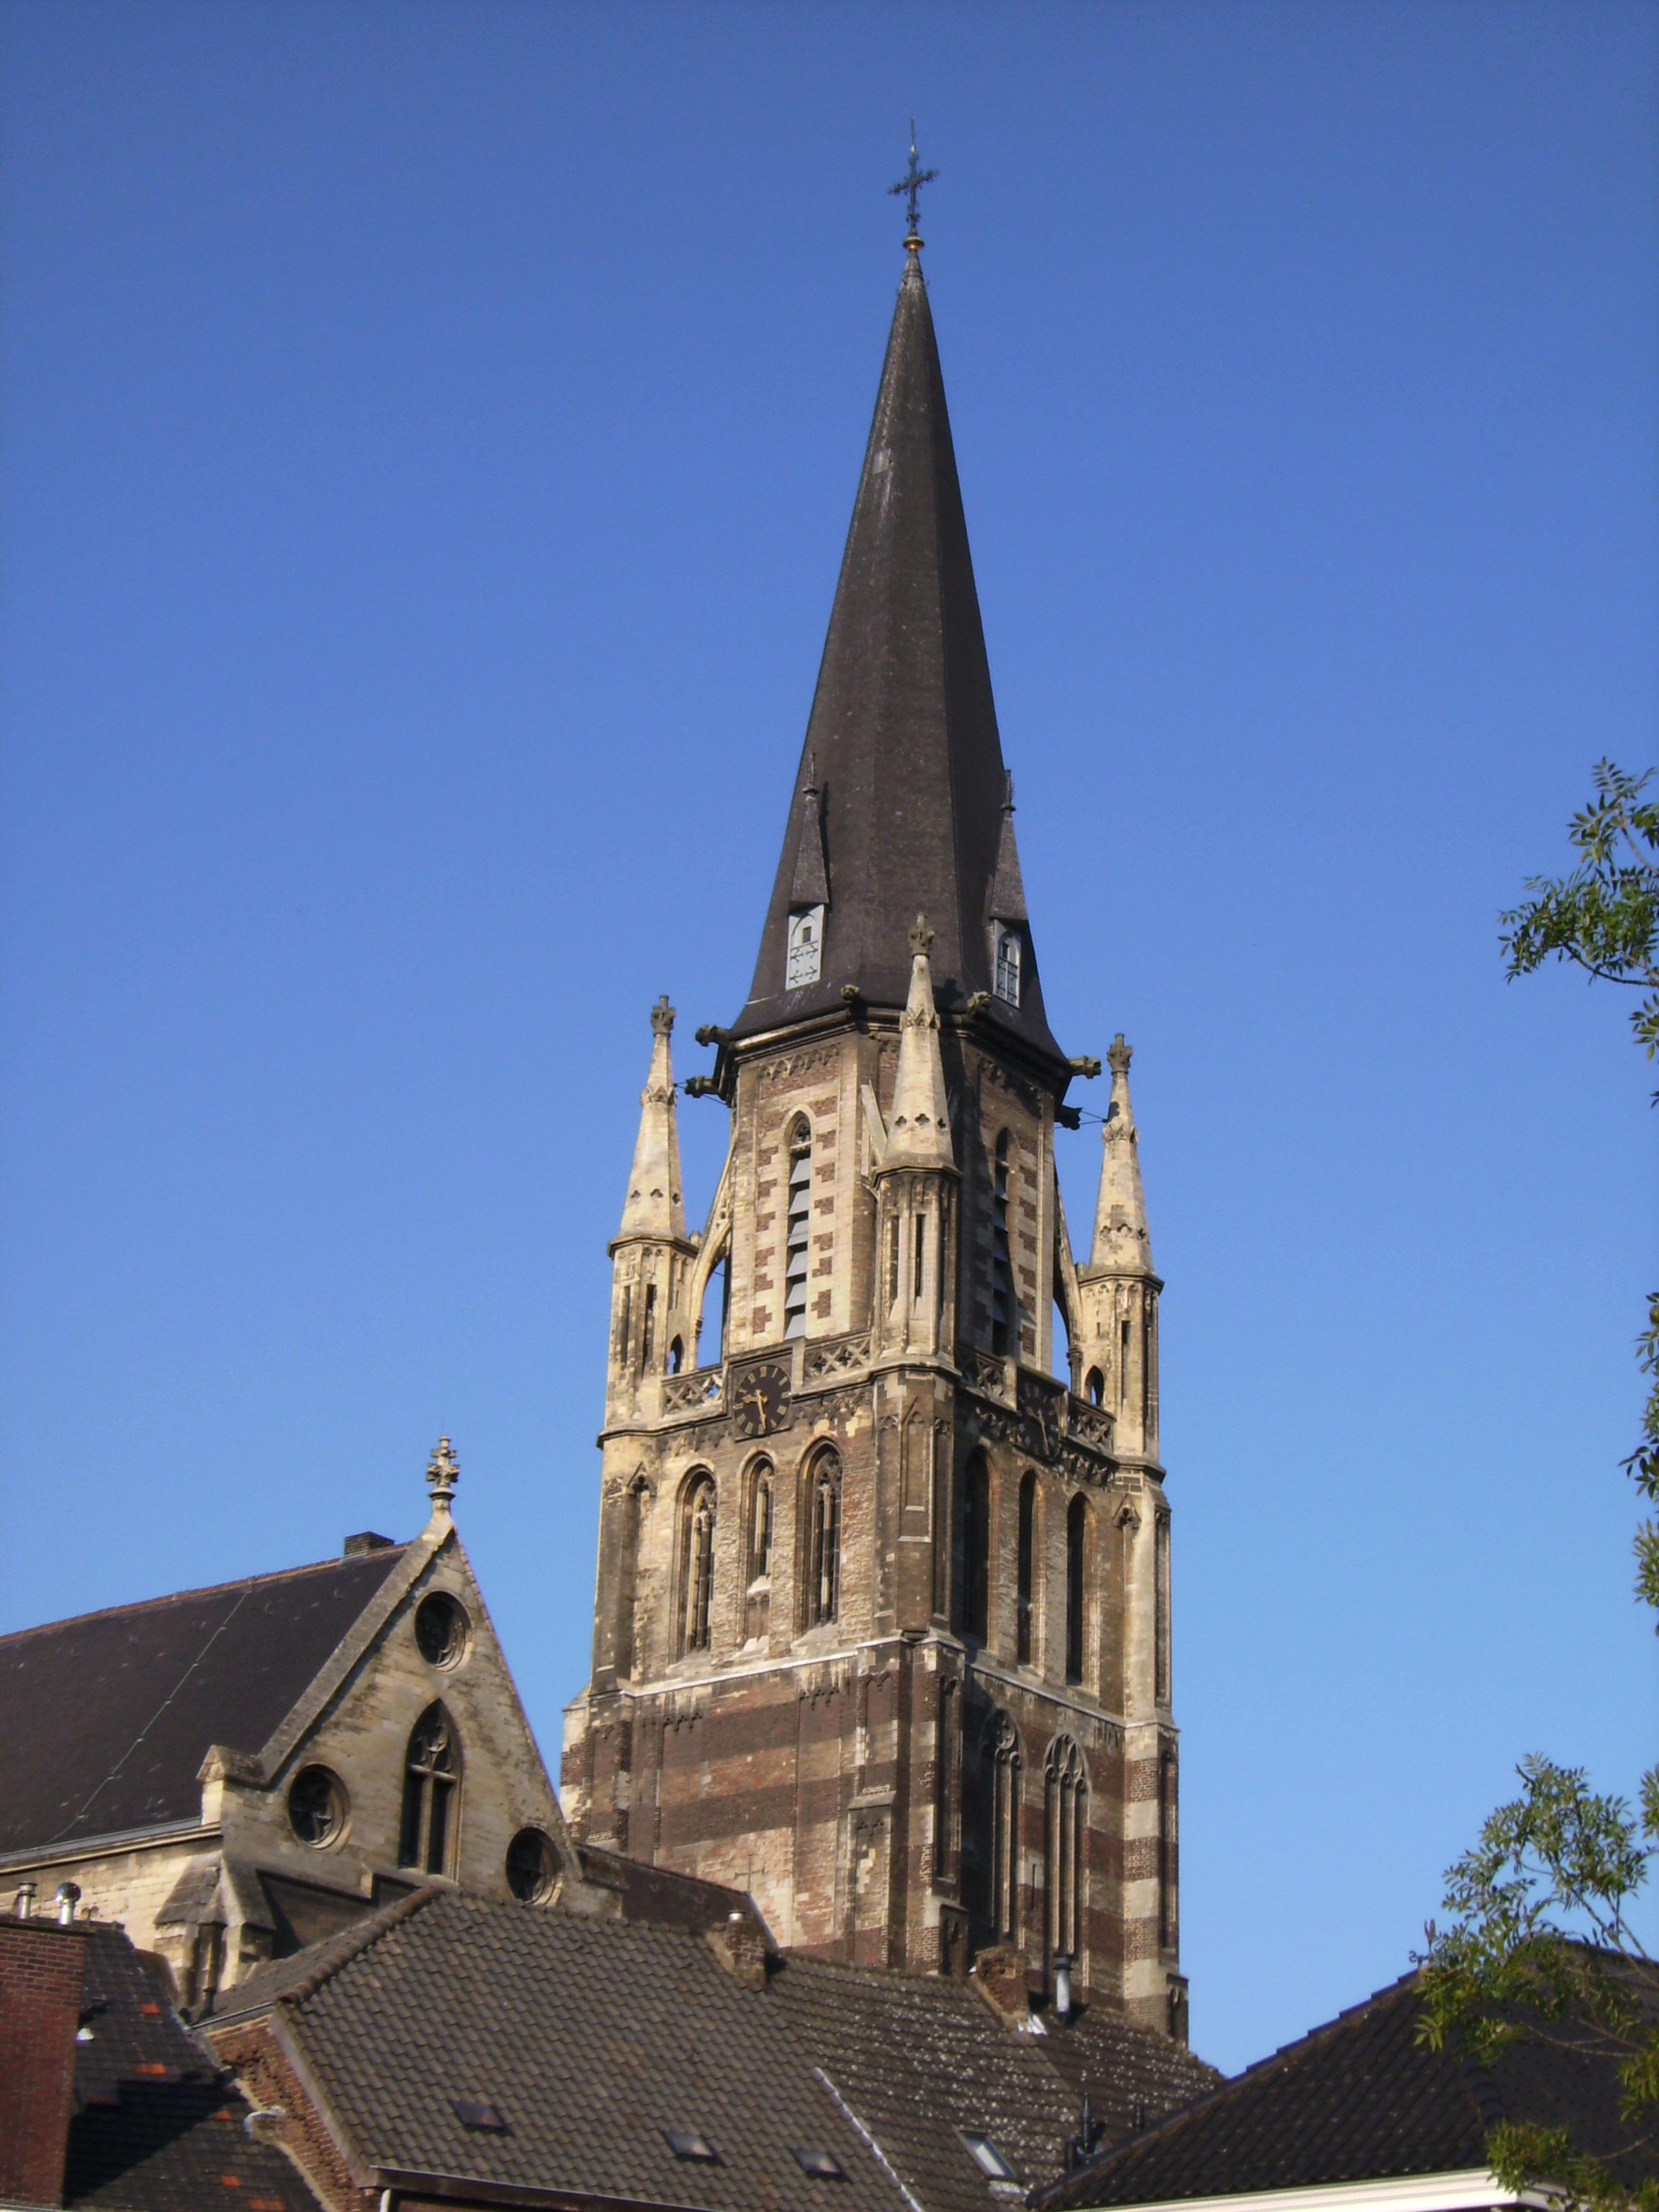 Sint Petrus u0026#39; Stoel van Antiochi u00ebkerk, gotische kruisbasiliek met hoge toren in Sittard